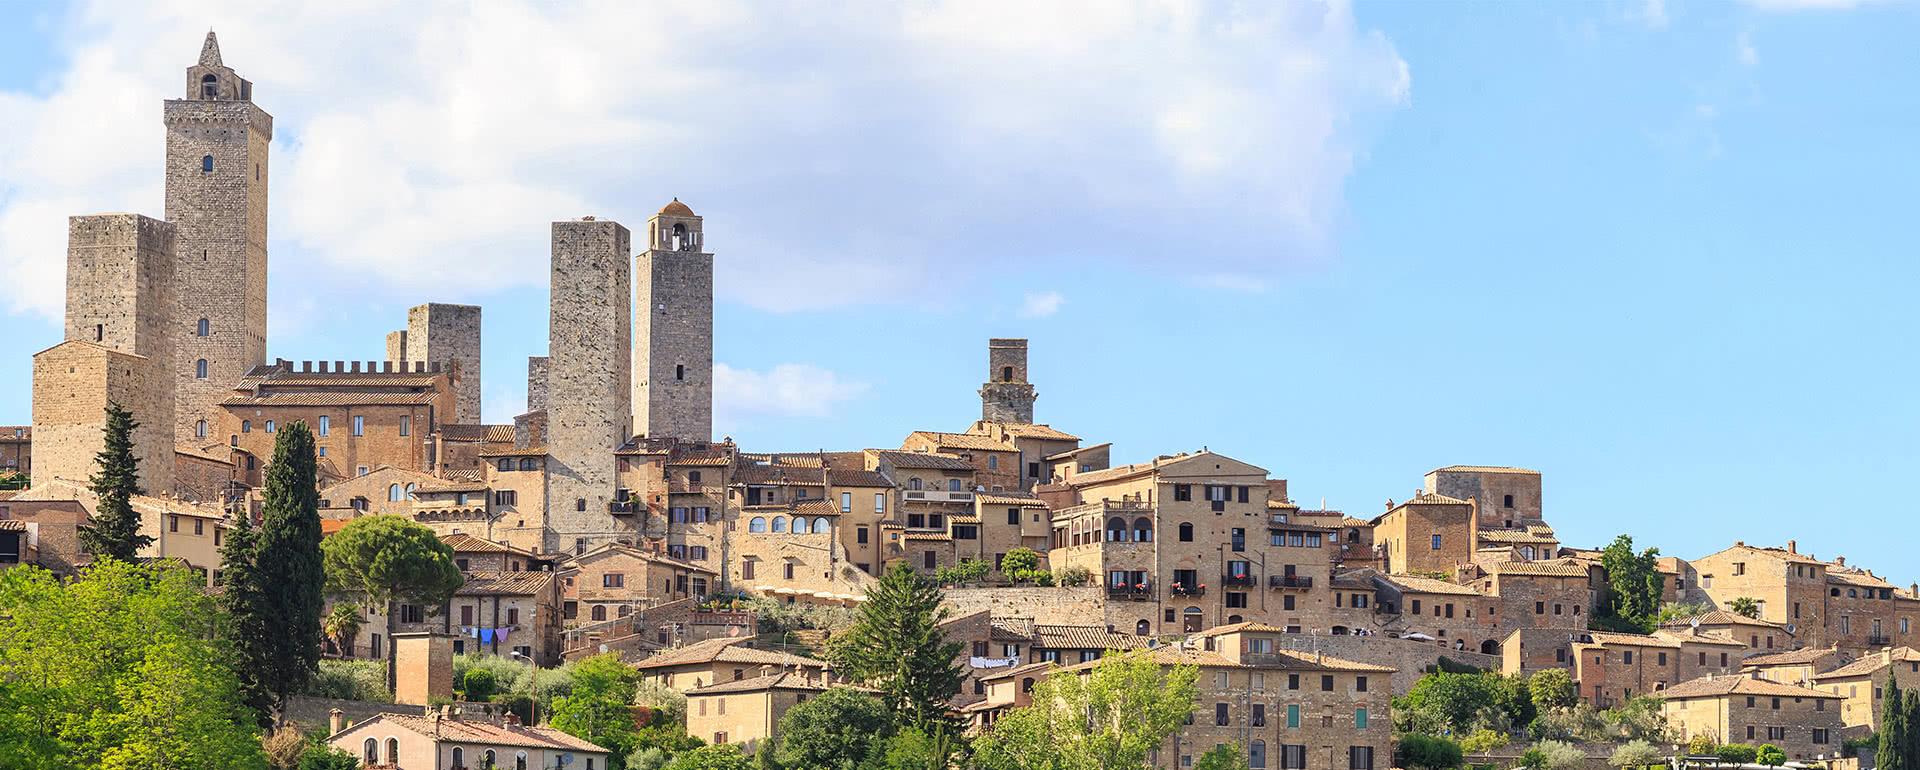 Titelbild von San Gimignano